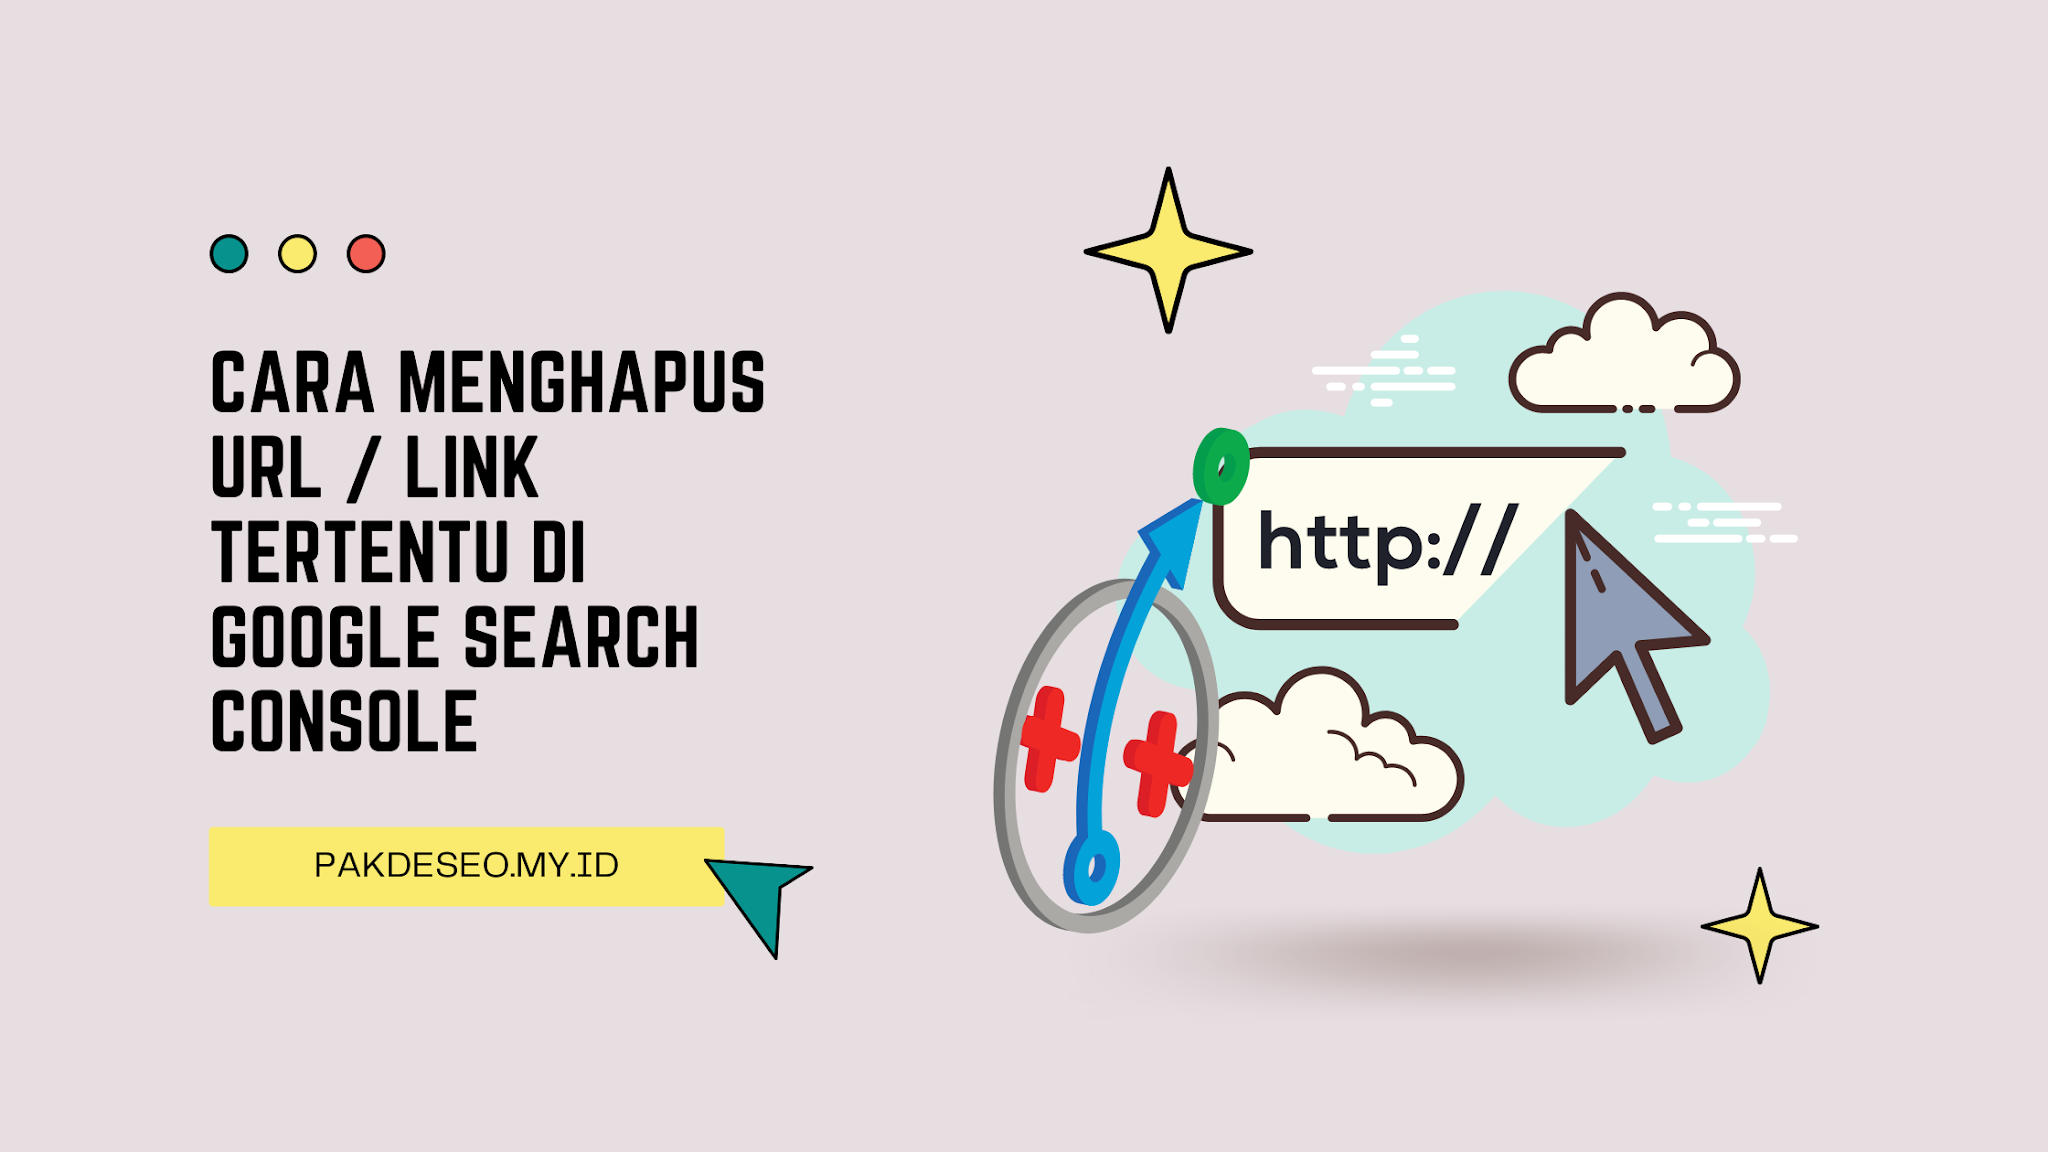 Cara Menghapus URL / Link Tertentu di Google Search Console